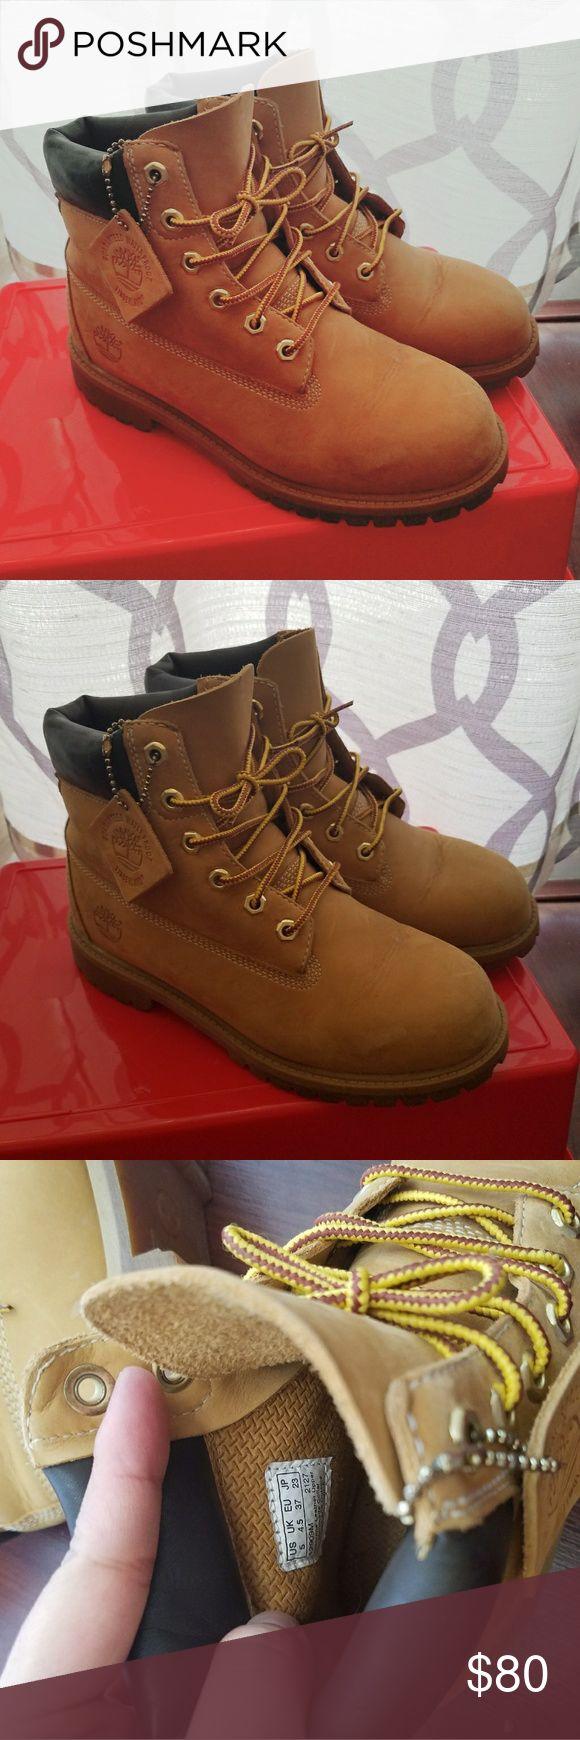 Timberland boots mens size 5 wheat Timberland boots mens size 5 wheat color. Make an offer Timberland Shoes Winter & Rain Boots